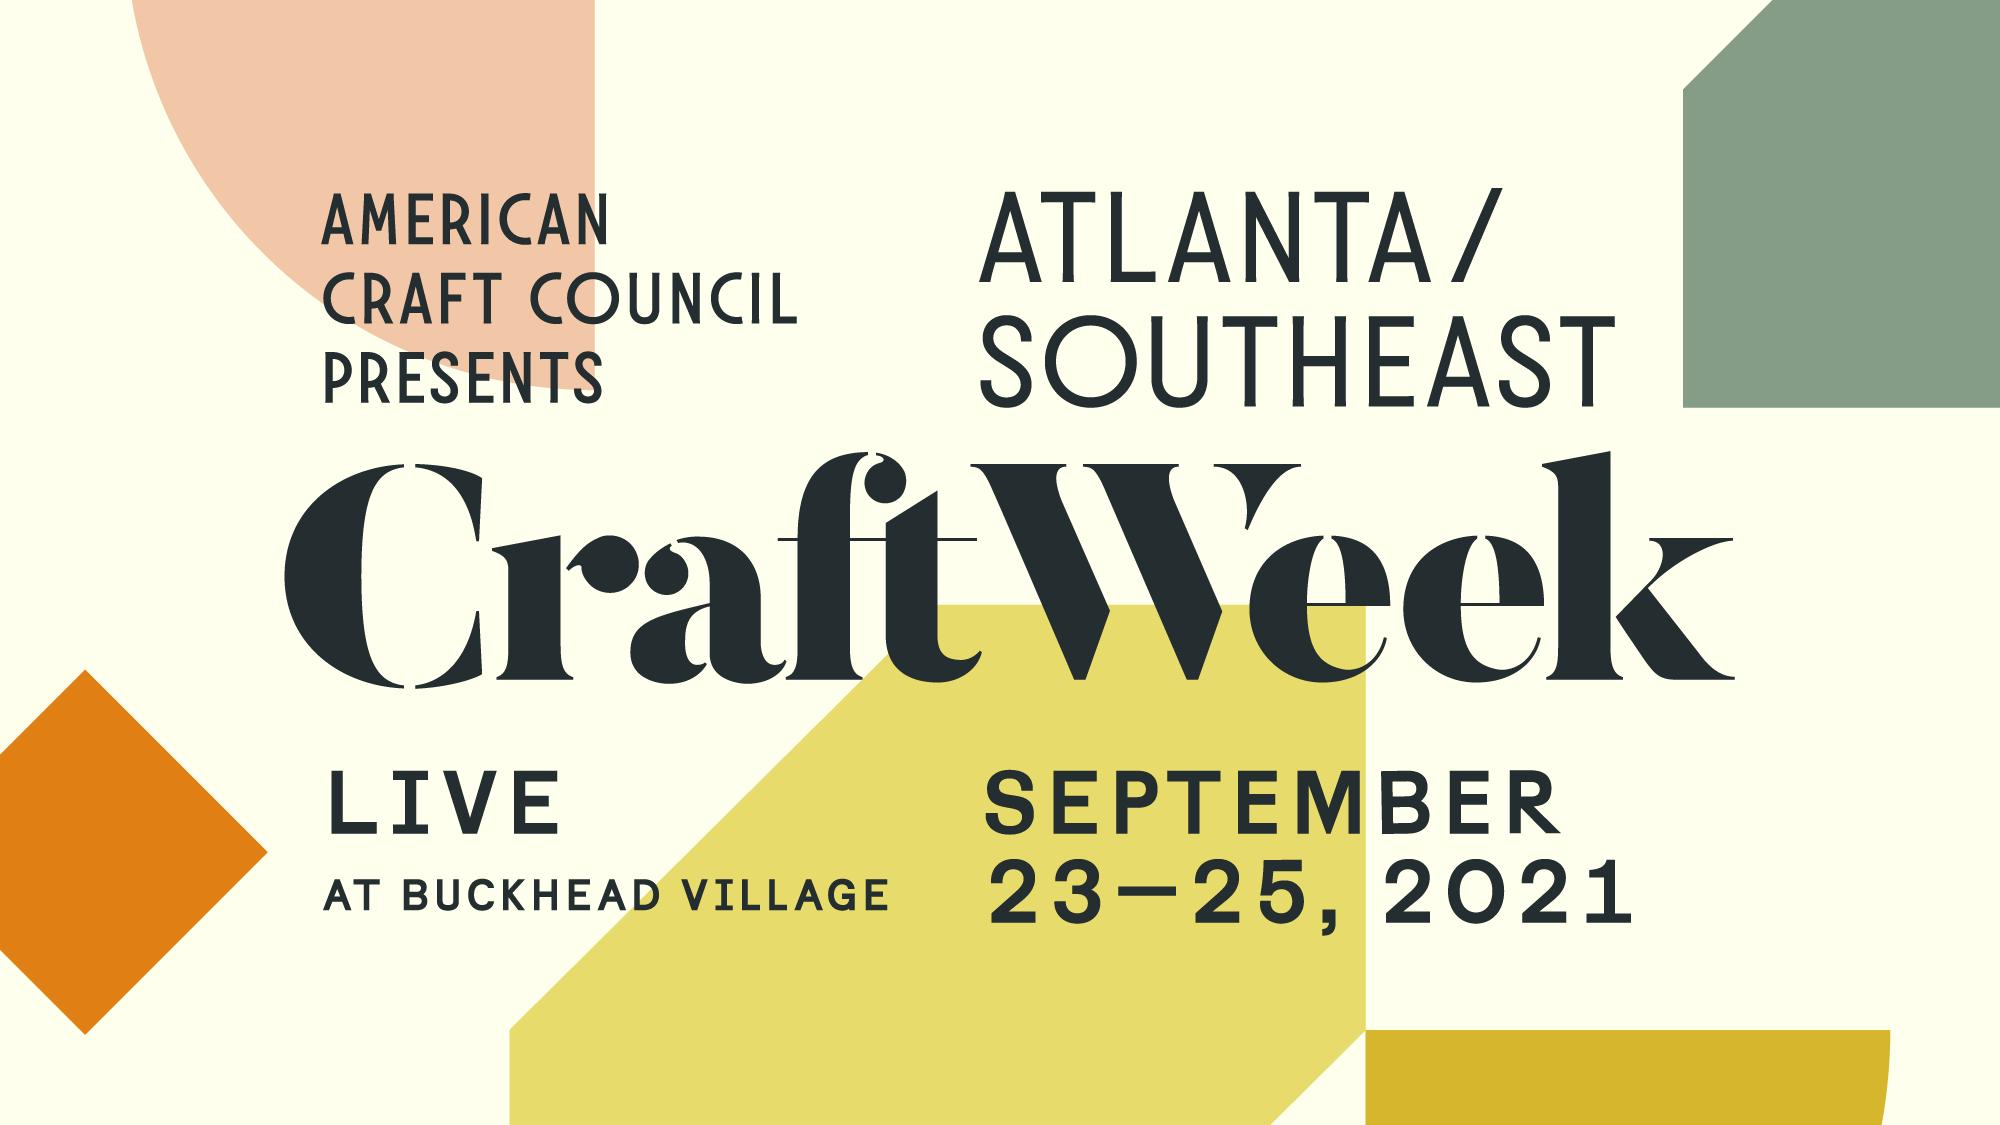 American Craft Council Presents Atlanta Southeast Craft Week Live at Buckead Village September 23 through 25 2021